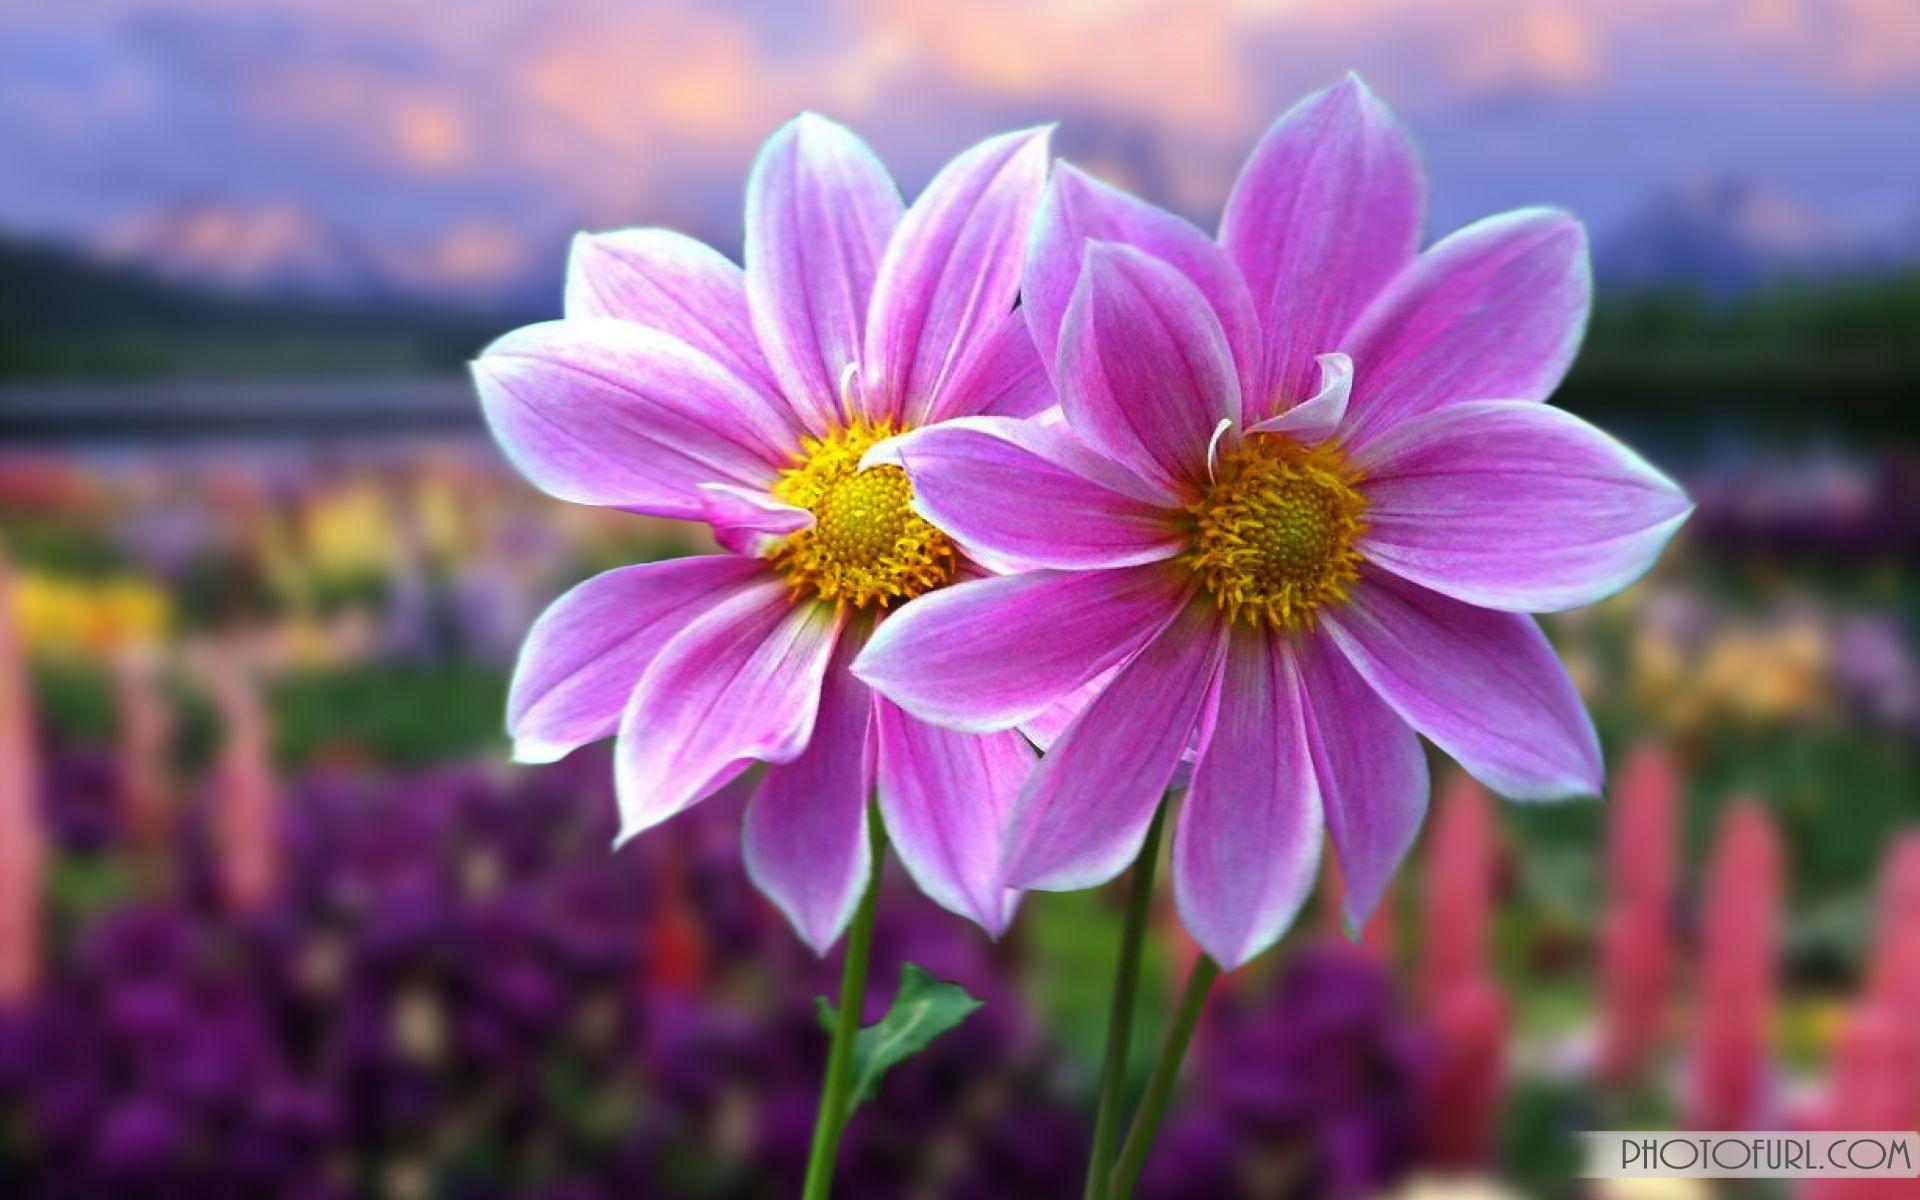 Most Beautiful Flowers Wallpapers For Desktop - Wallpaper Cave